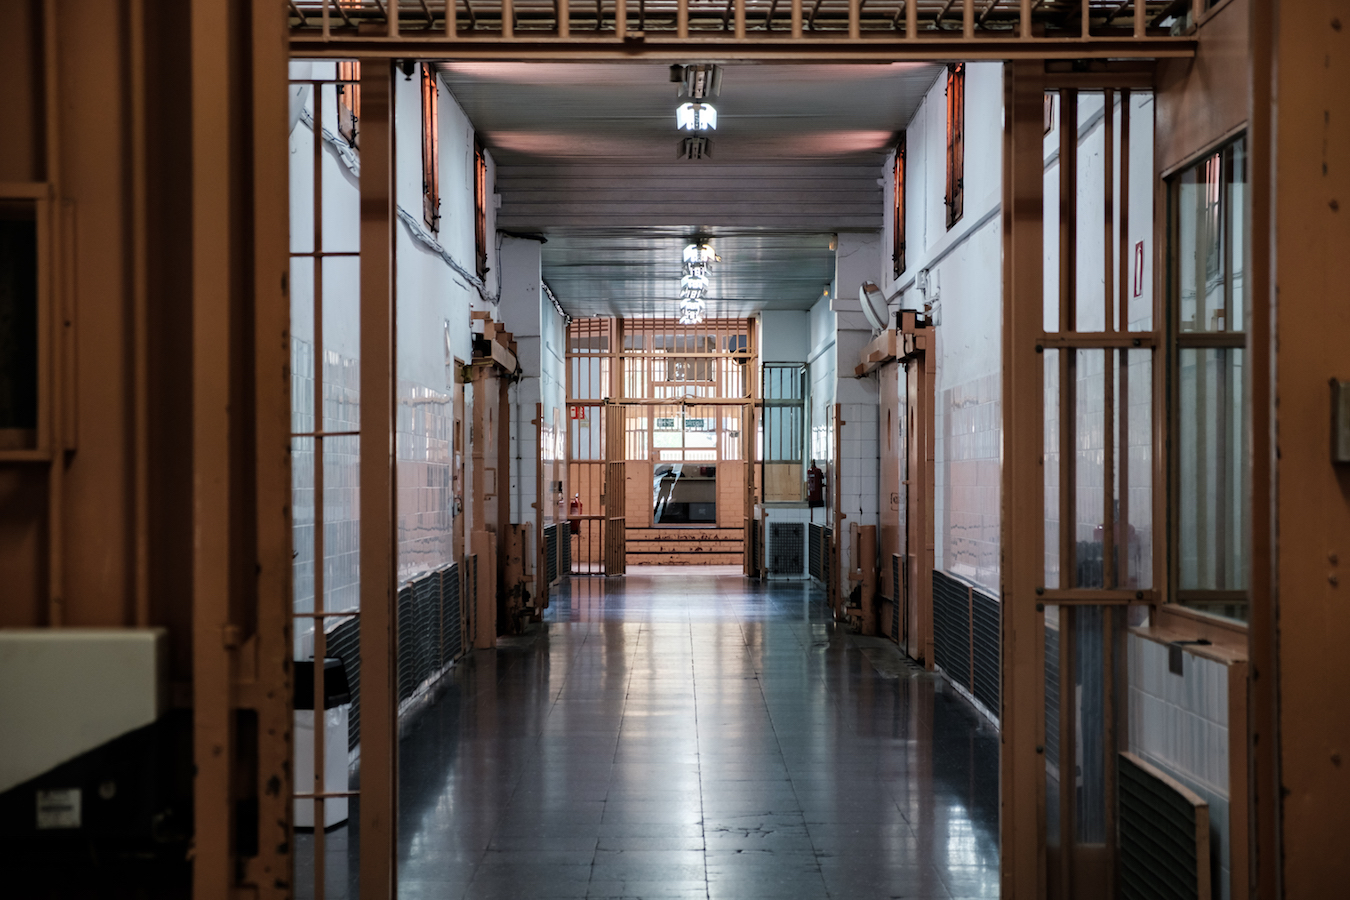 La Modelo Prison in Barcelona - Copyright Ben Holbrook of www.driftwoodjournals.com 2018